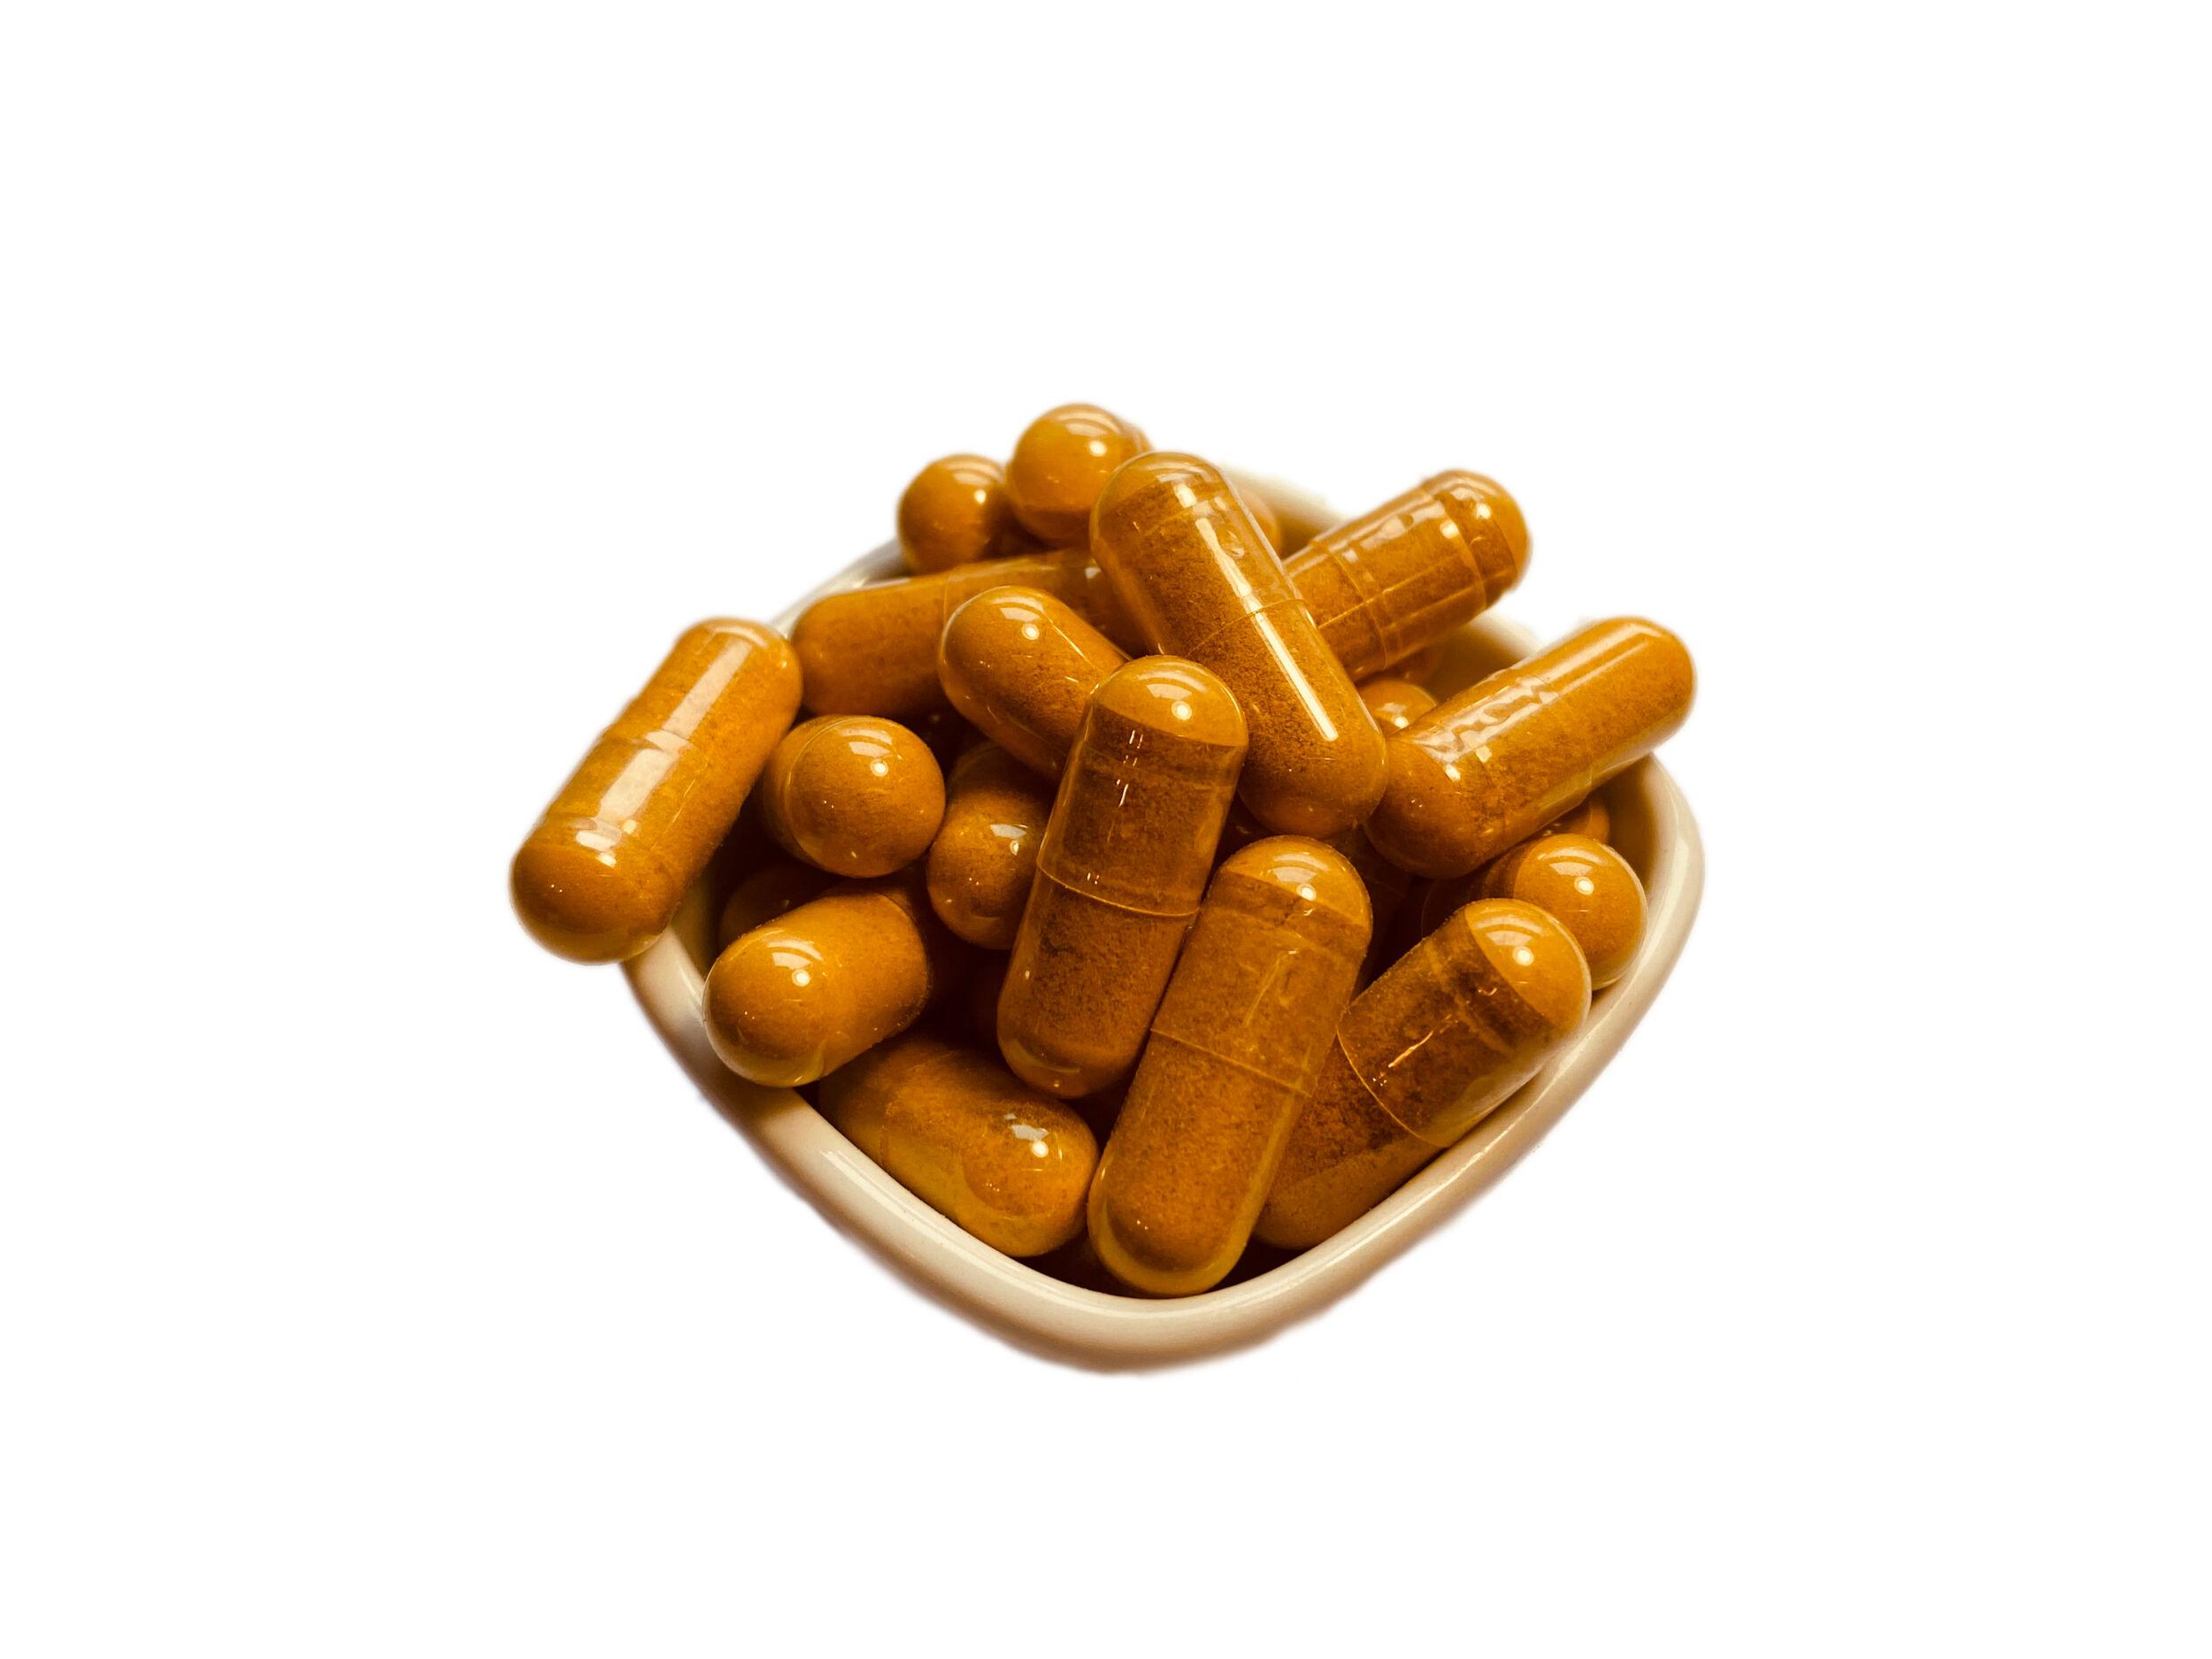 Gina-Épices Mélange 9-5-1 de Madagascar : Curcuma, Gingembre, Poivre noir - Gélules 600 mg